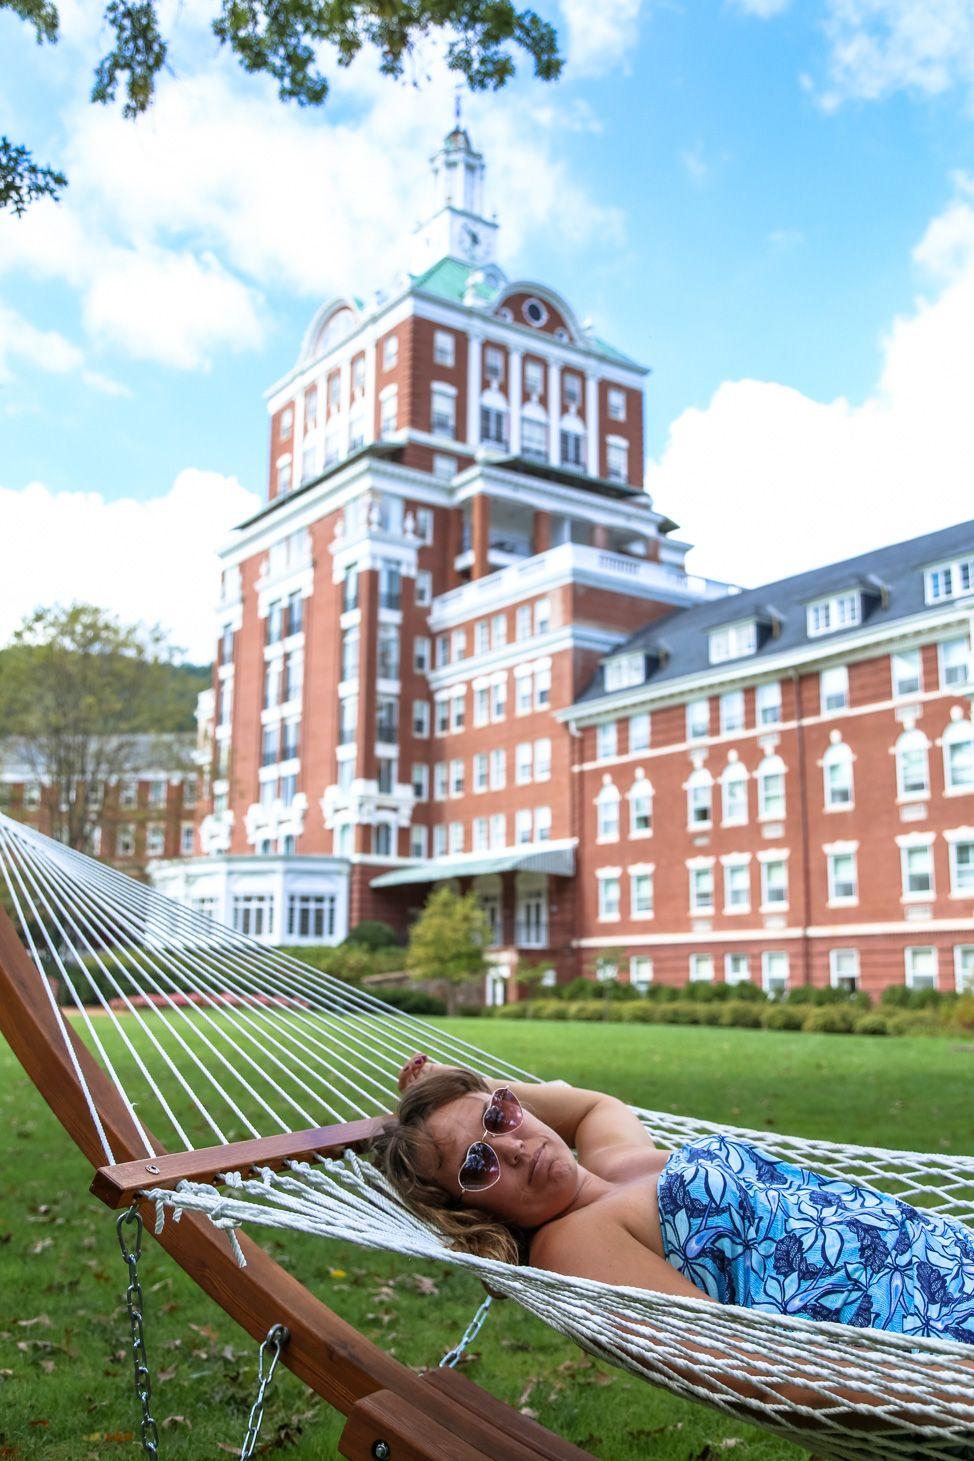 Kicking Back At Virginia's Iconic Homestead Resort